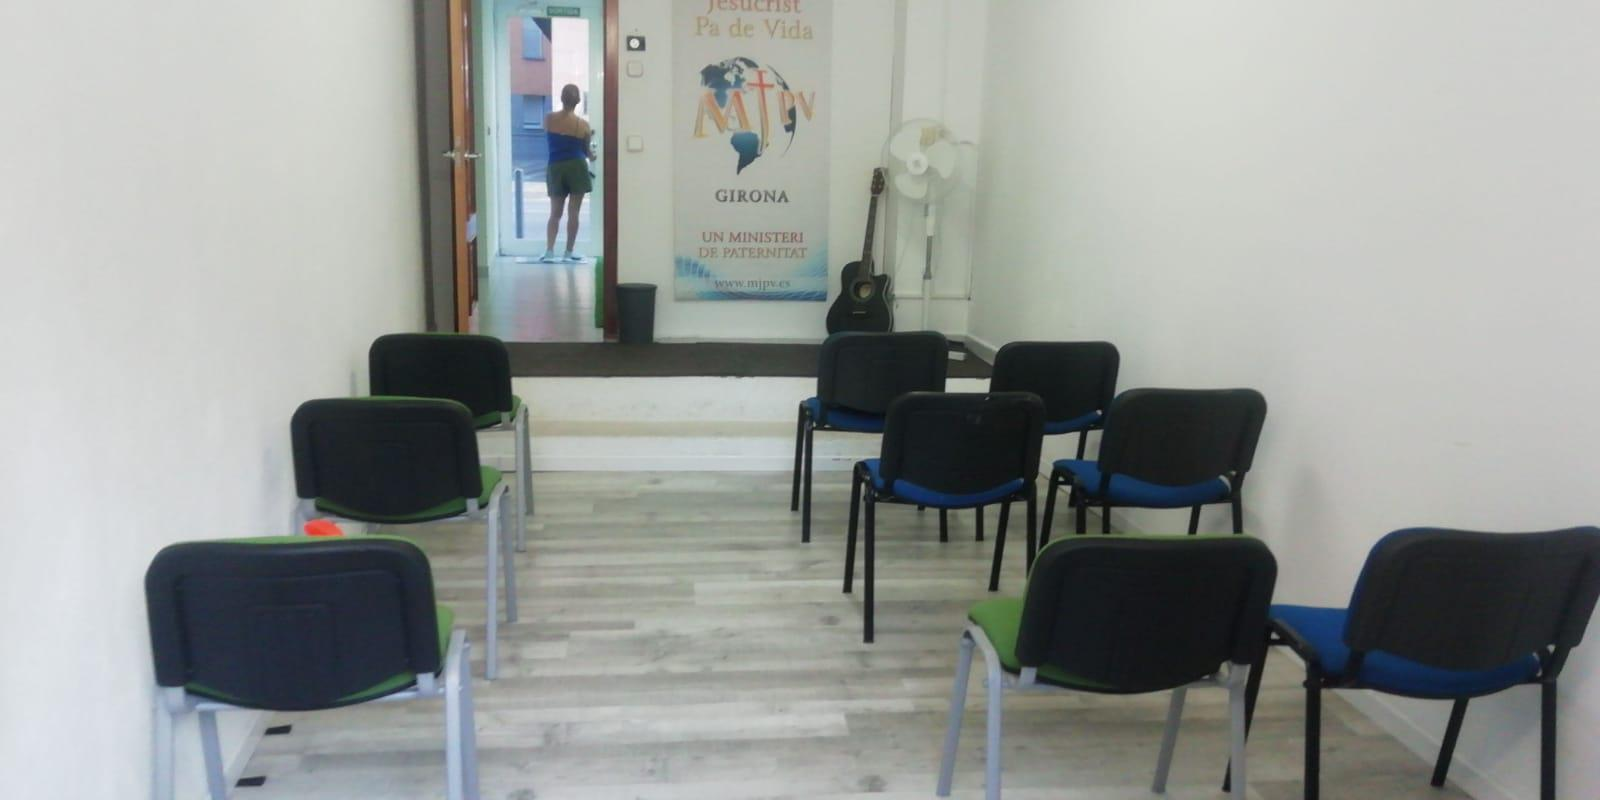 Imagen 1 Local Comercial en venta en Girona / Local comercial de 35 m2 al costat de Maristes.